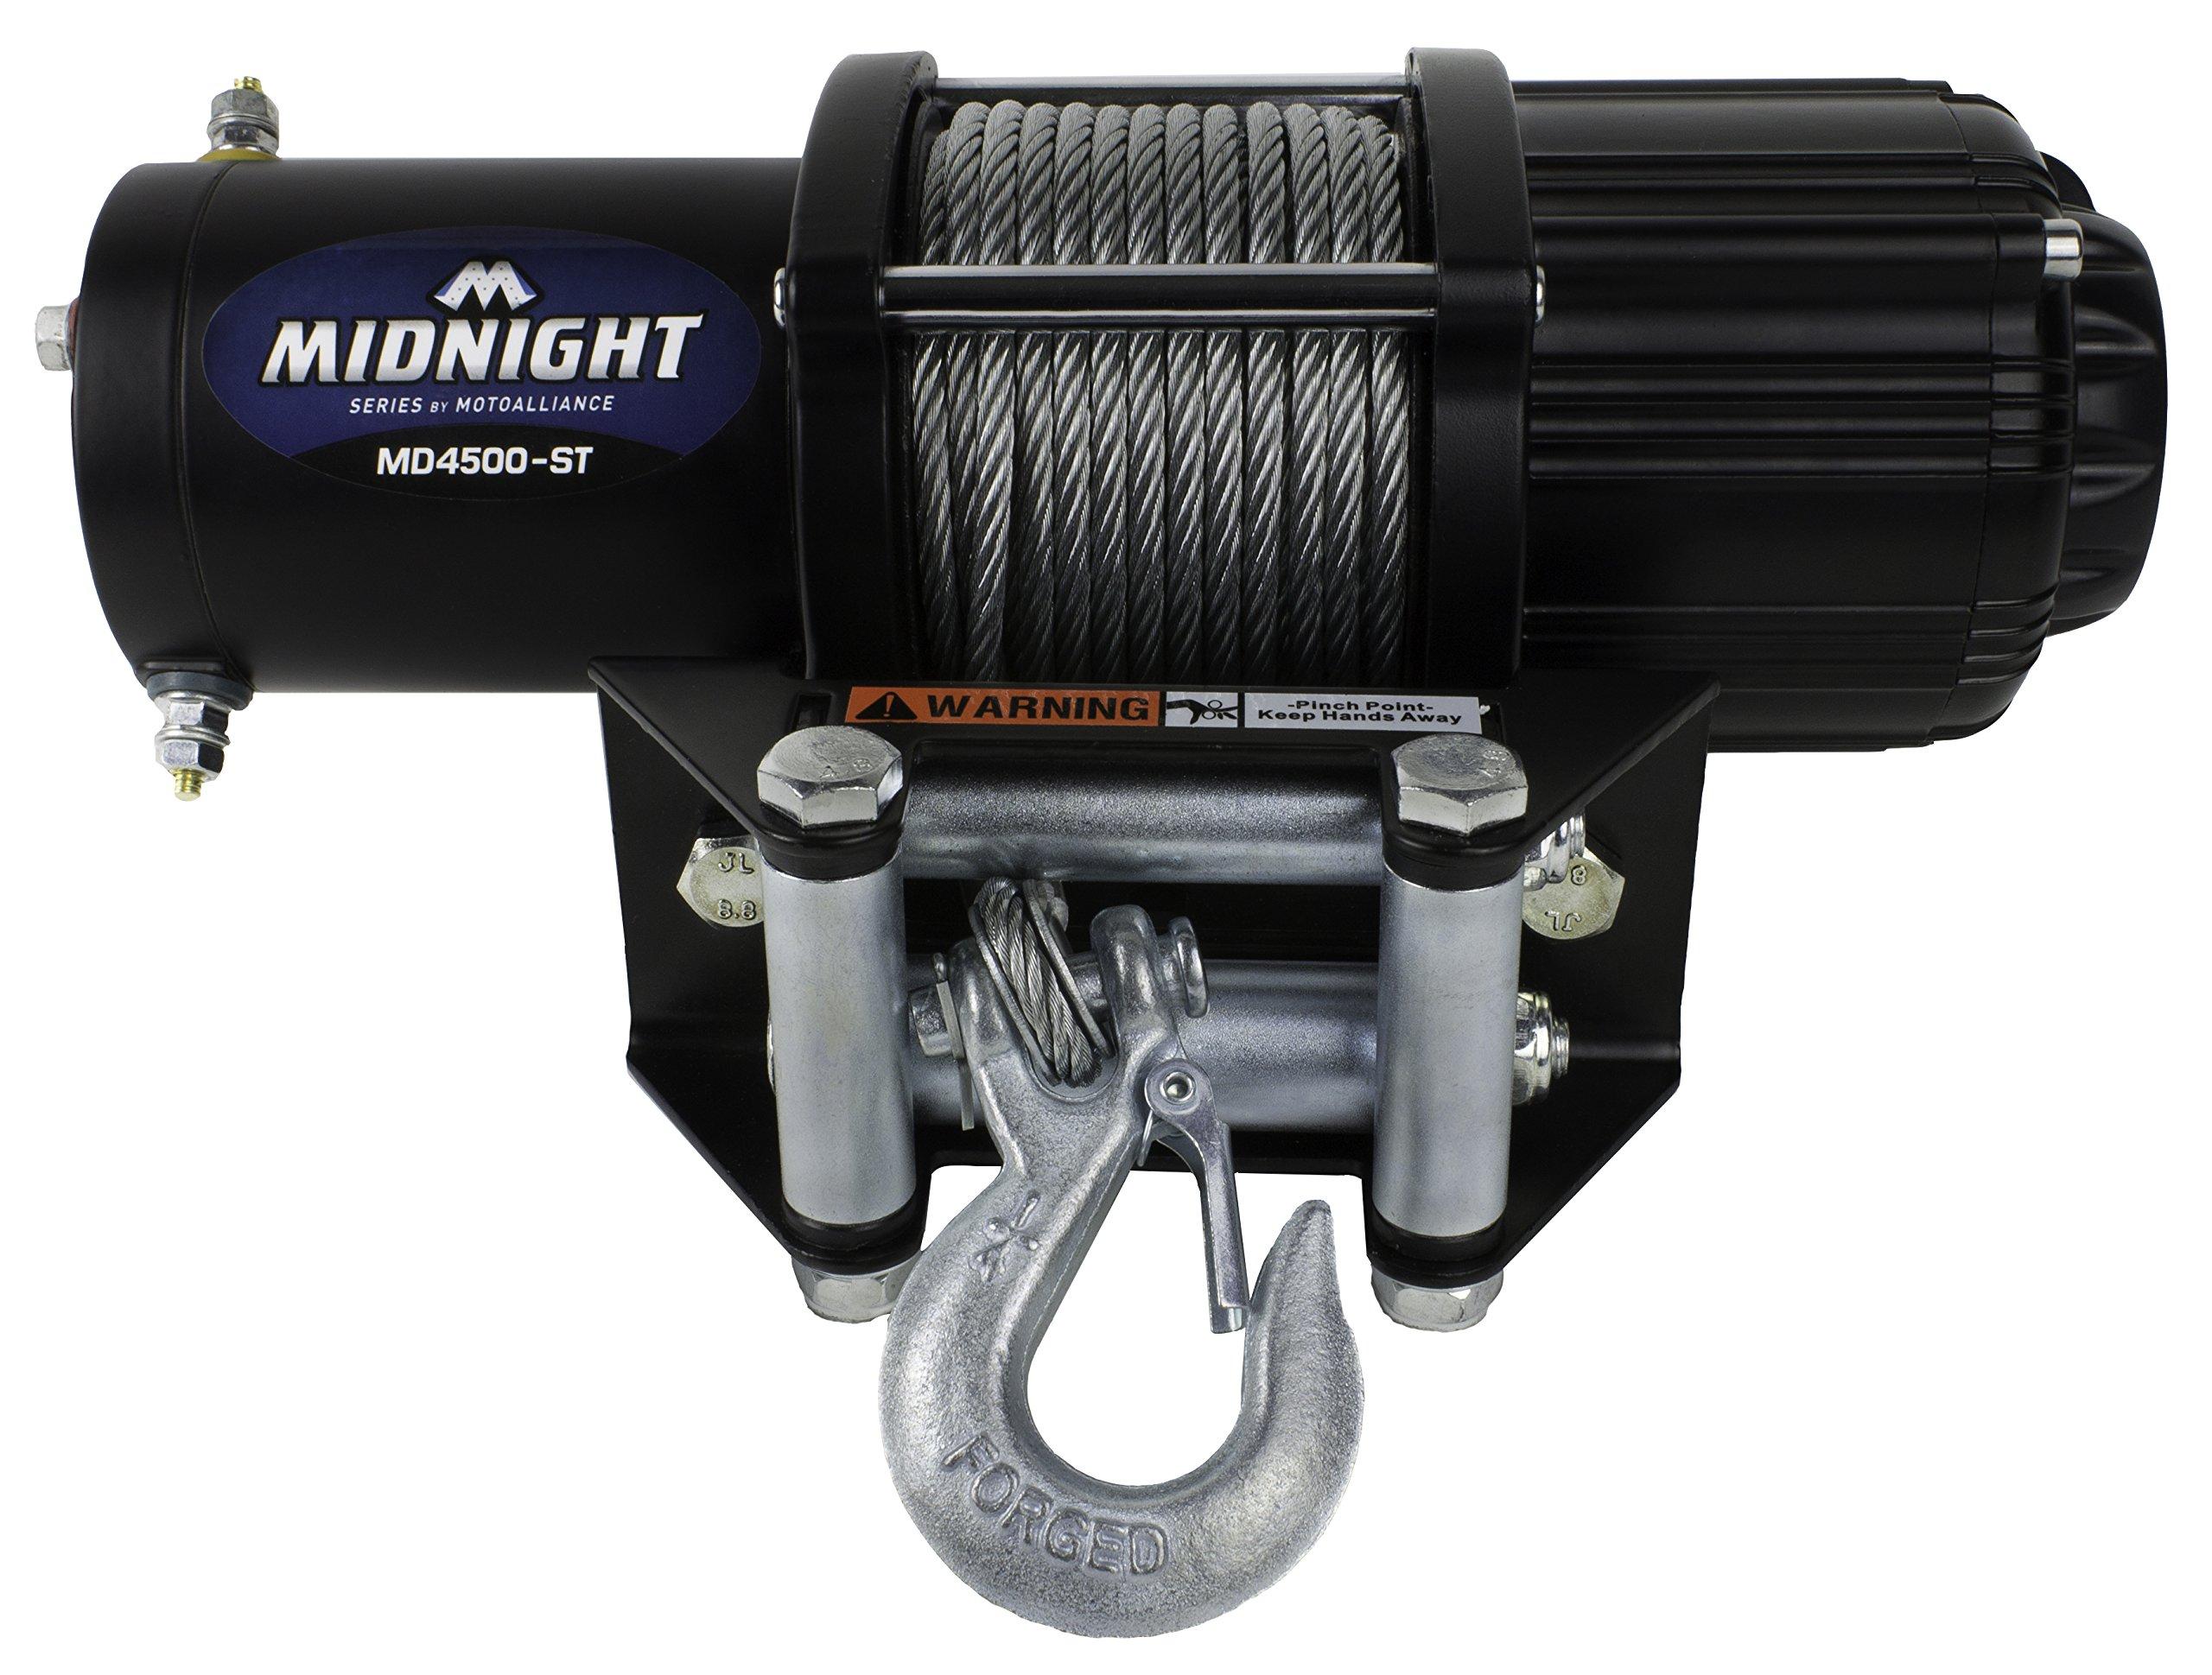 VIPER Midnight 4500lb ATV/UTV Winch Kit with 50 feet Steel Cable